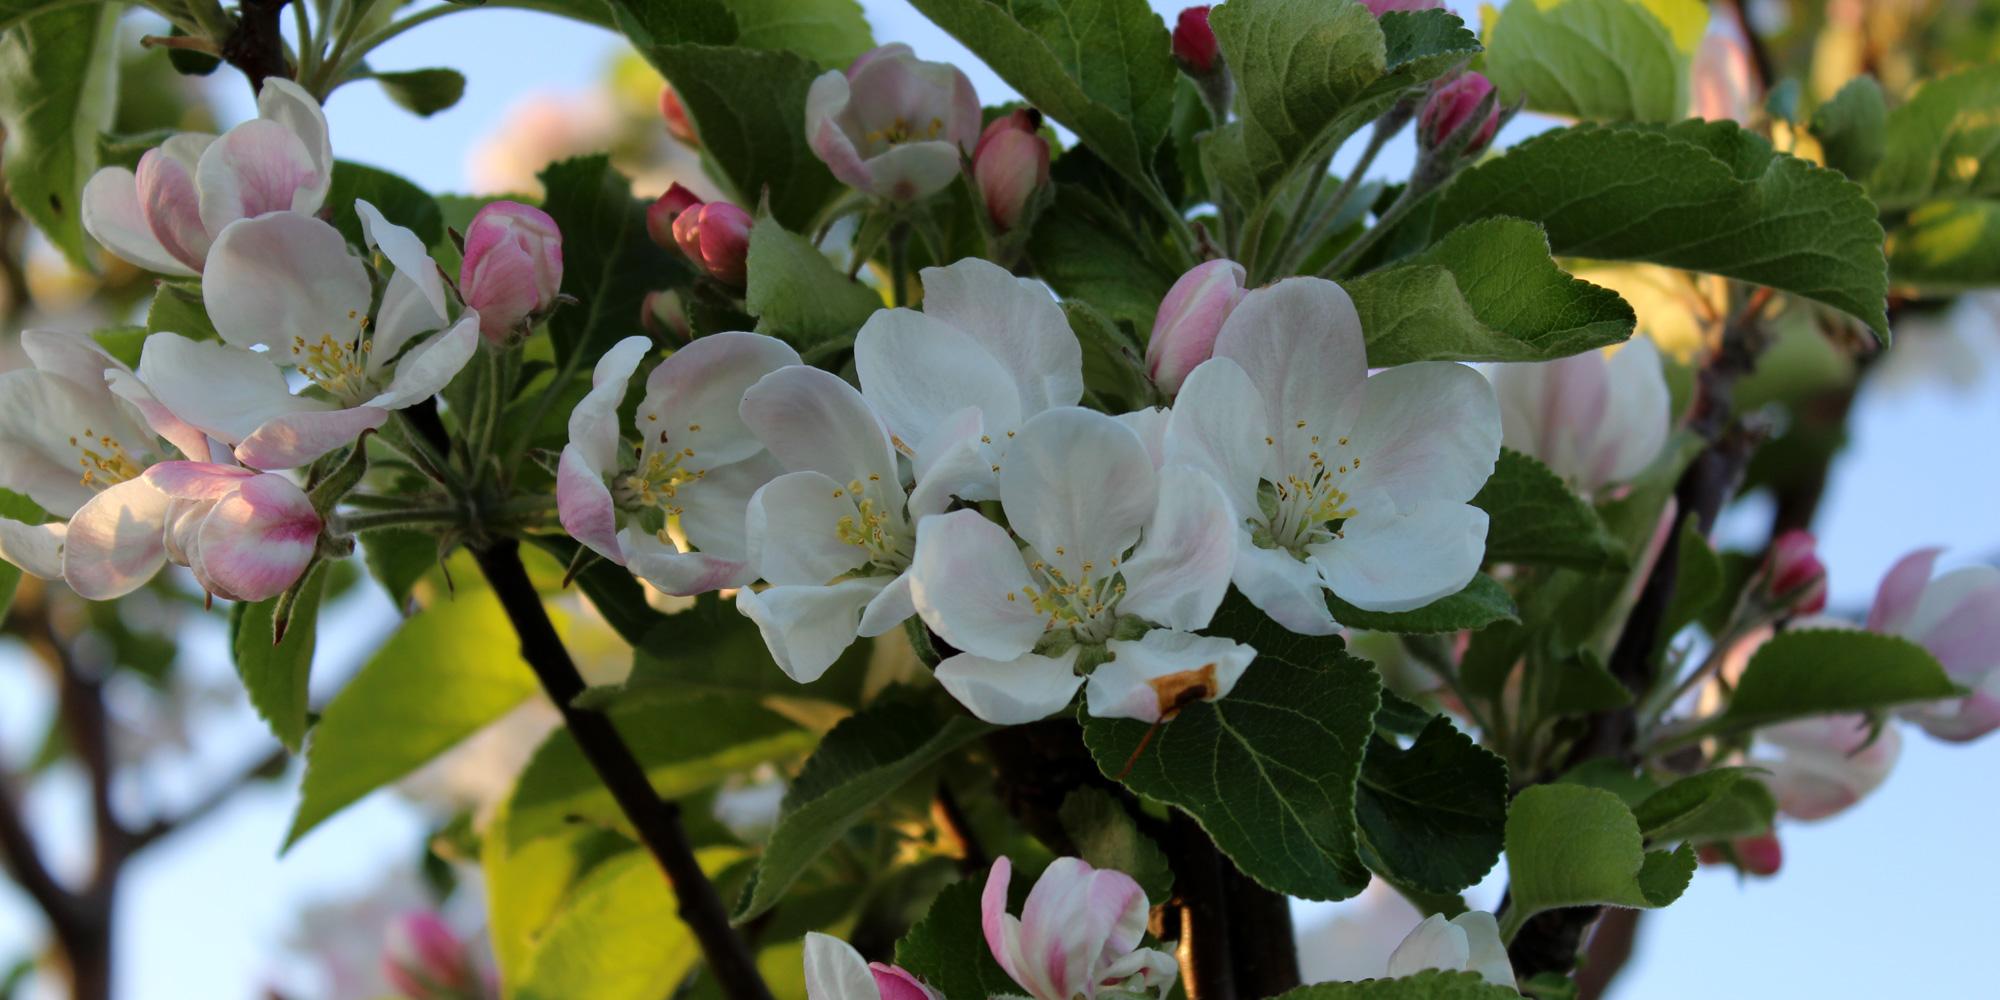 Epletre i blomst på Mikkelhaug gård i Levanger. Copyright: Mikkelhaug